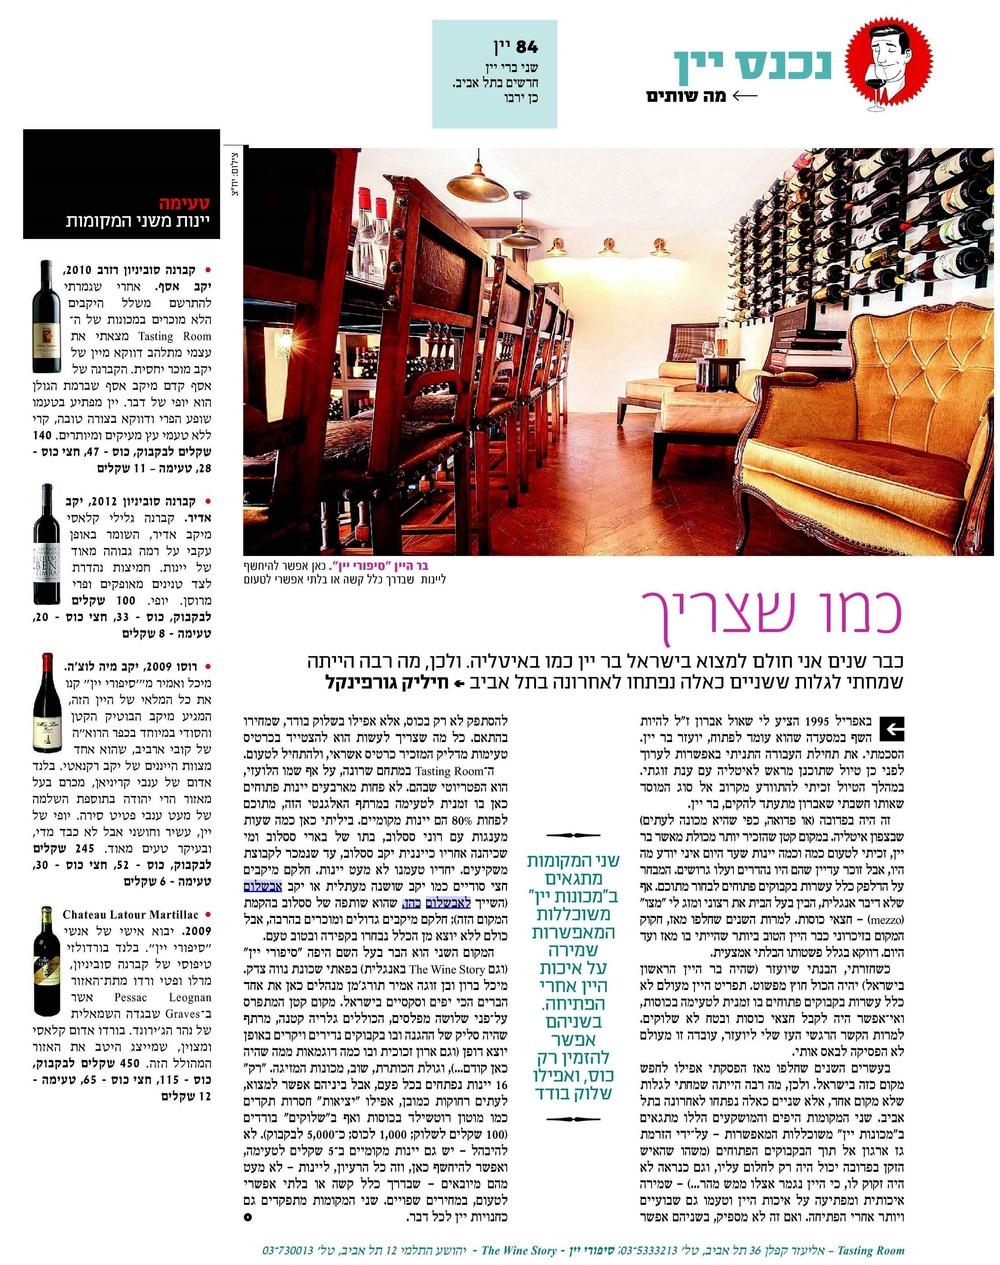 Tasting Room Wine Bar טייסטינג רום בר יין מגזין גלובס